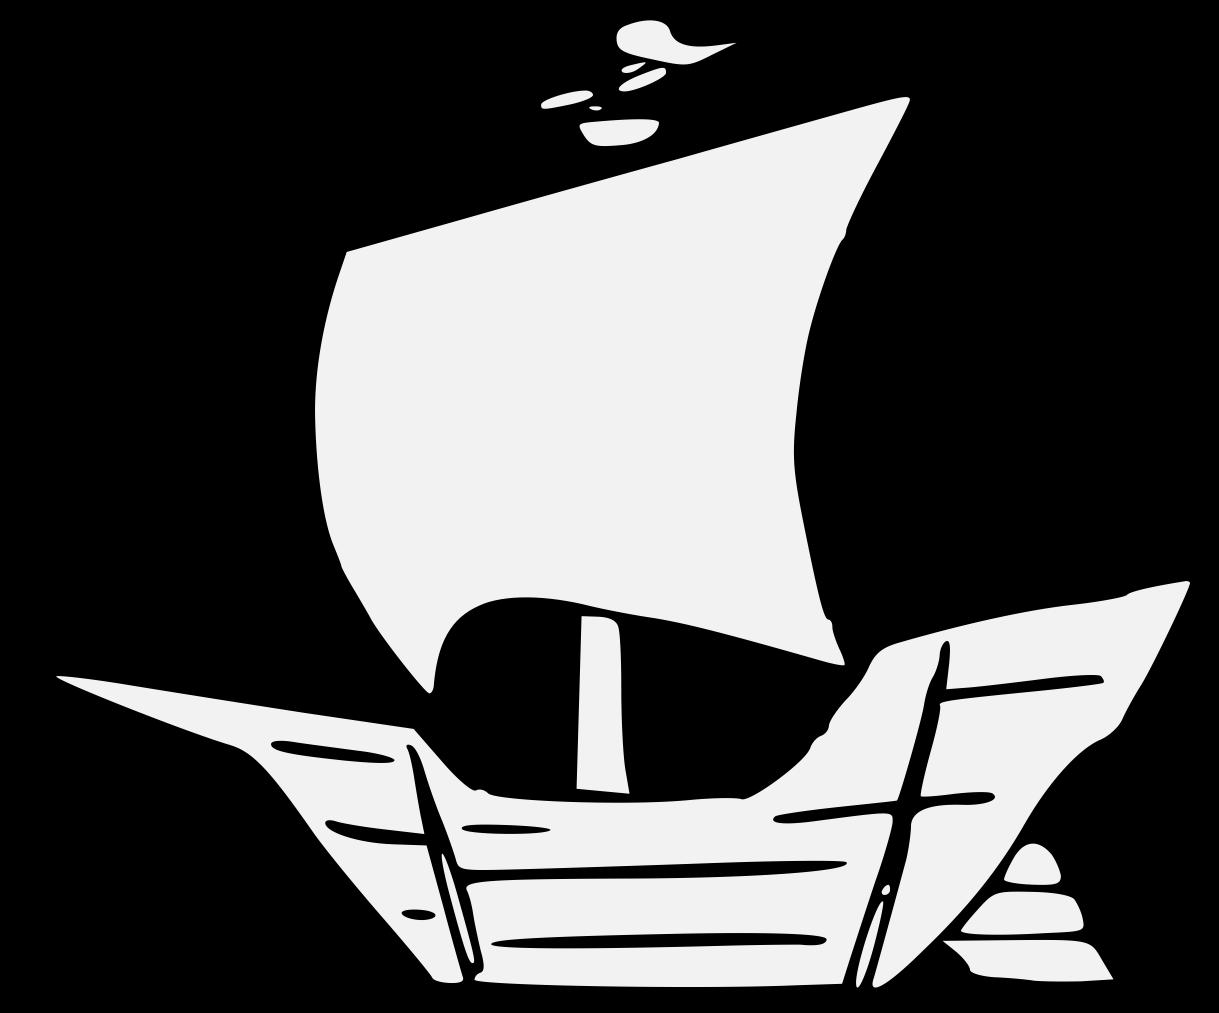 Mayflower clipart drawing. Caravel at getdrawings com